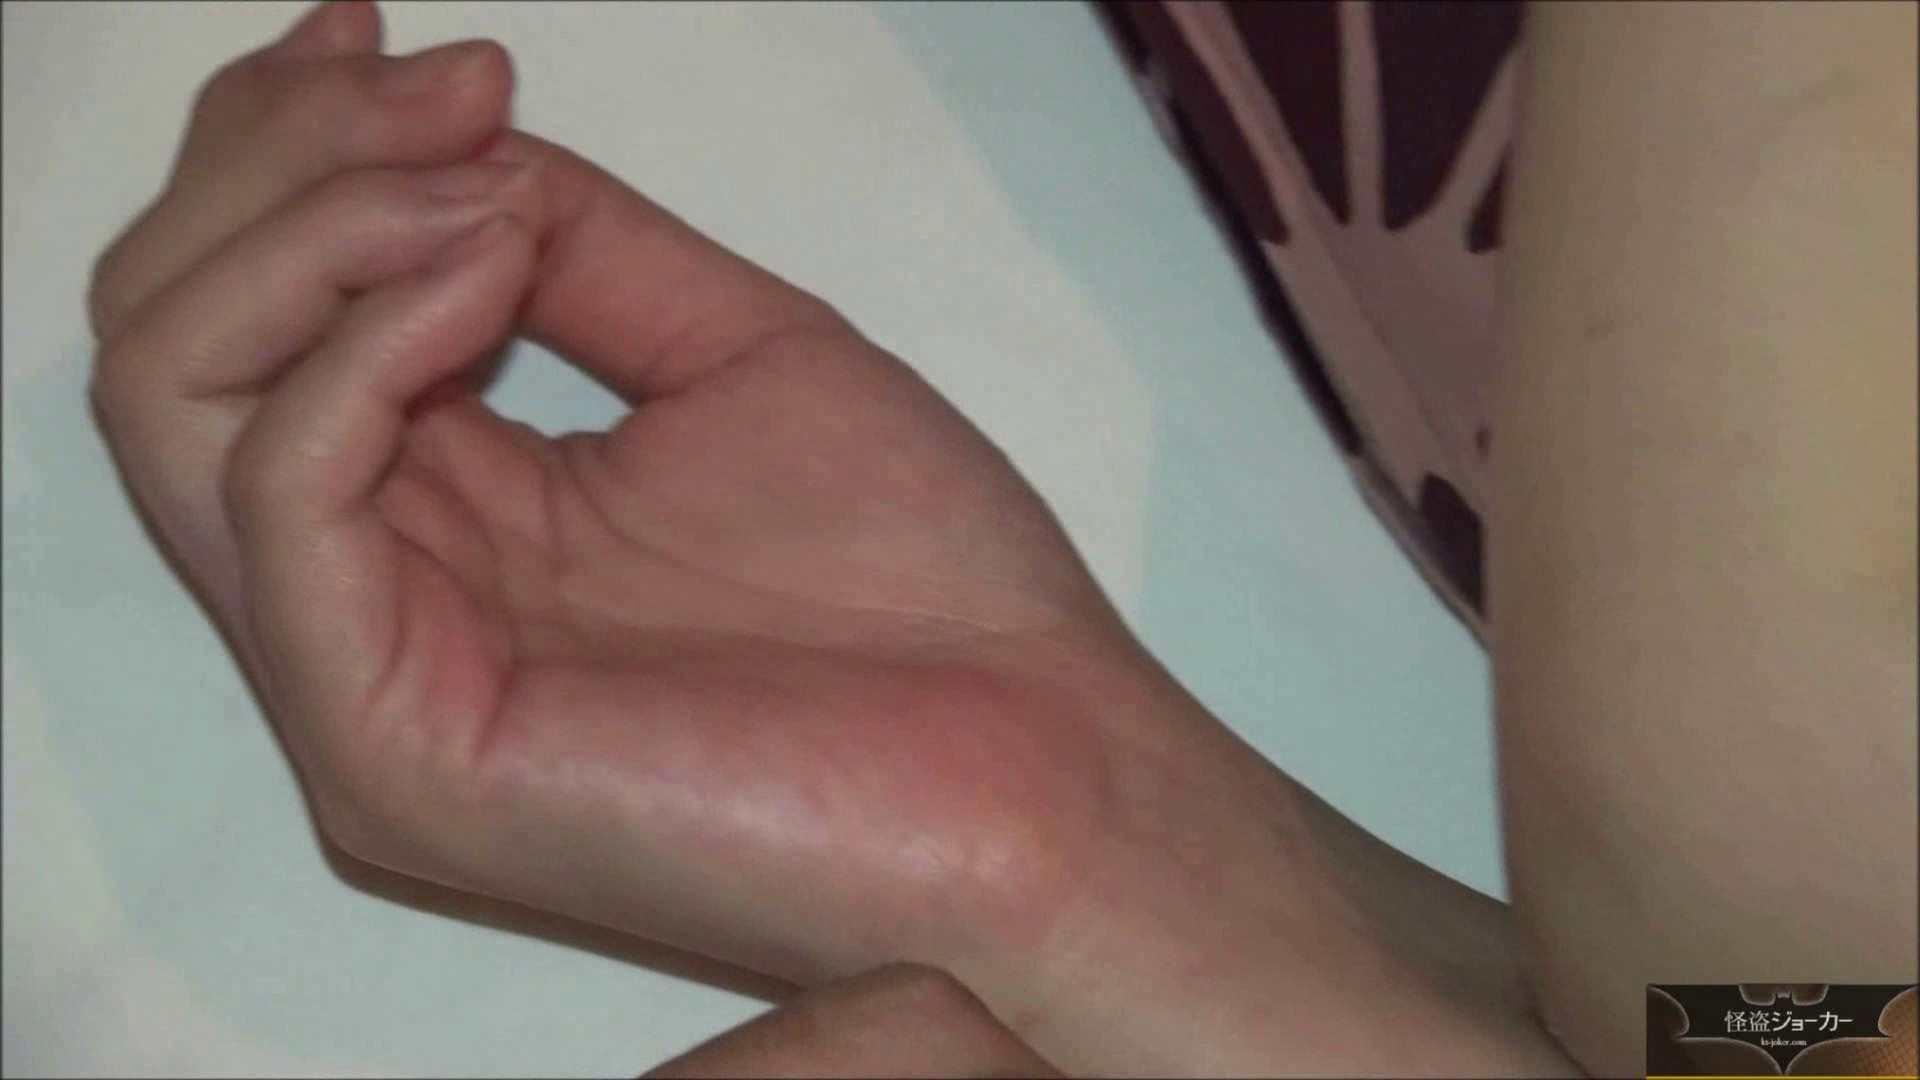 vol.3 【美人ショップ店員】杏奈ちゃん☆コンパで一気連発w 丸見え ぱこり動画紹介 86枚 3